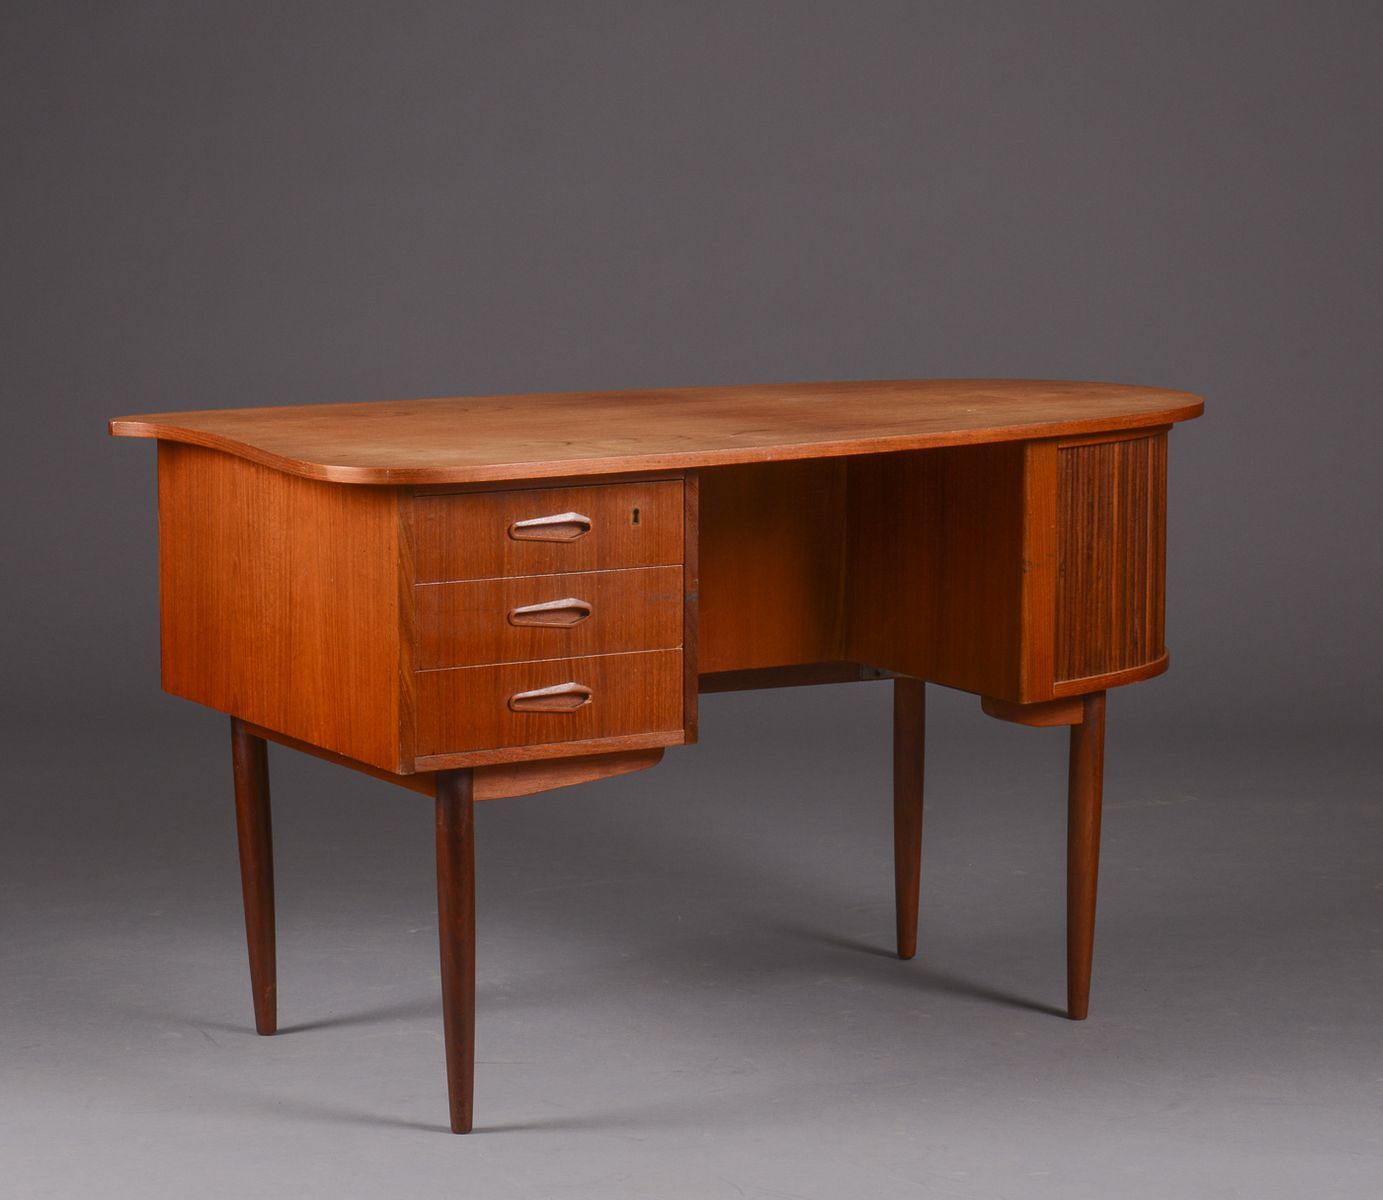 teak writing desk Mid century danish modern teak writing desk w chair mid century - $19900 mid century modern mcm danish teal and wood side arm desk chair sleek design.